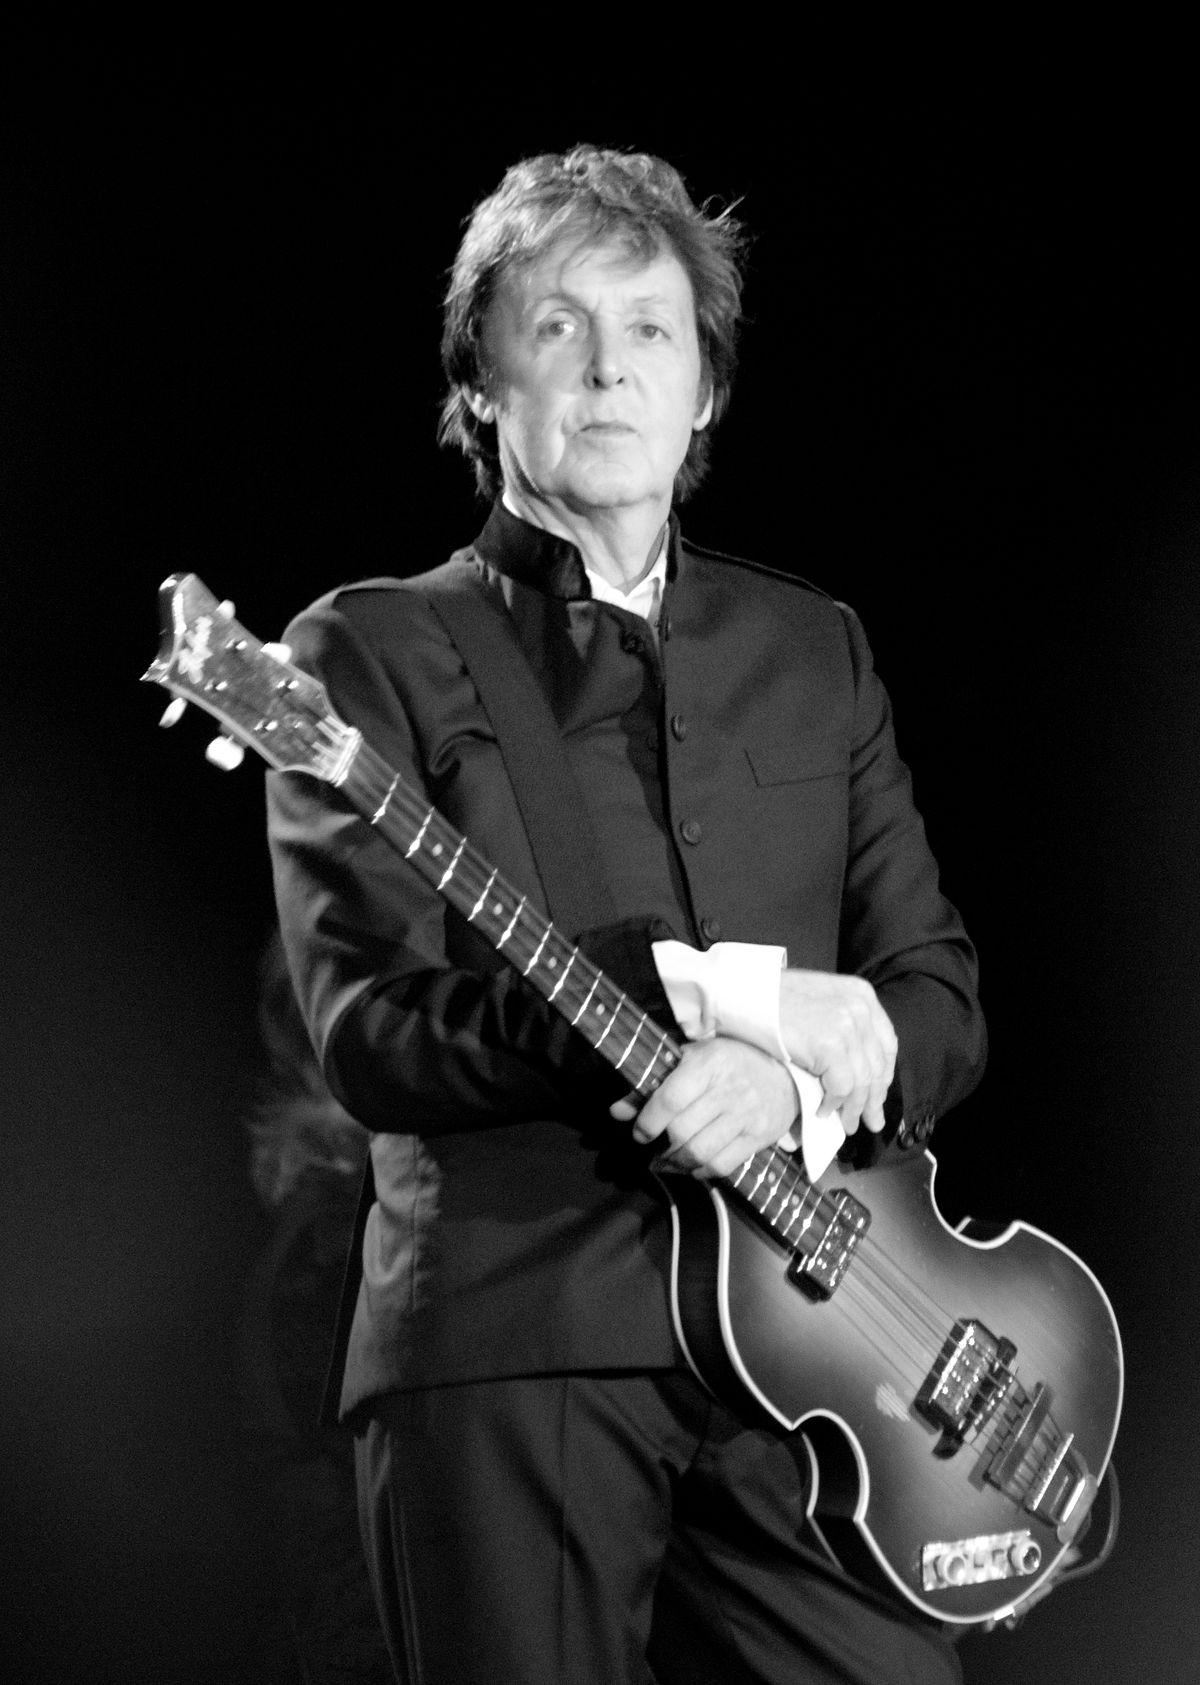 Drawn musician back to school  Paul Wikipedia McCartney